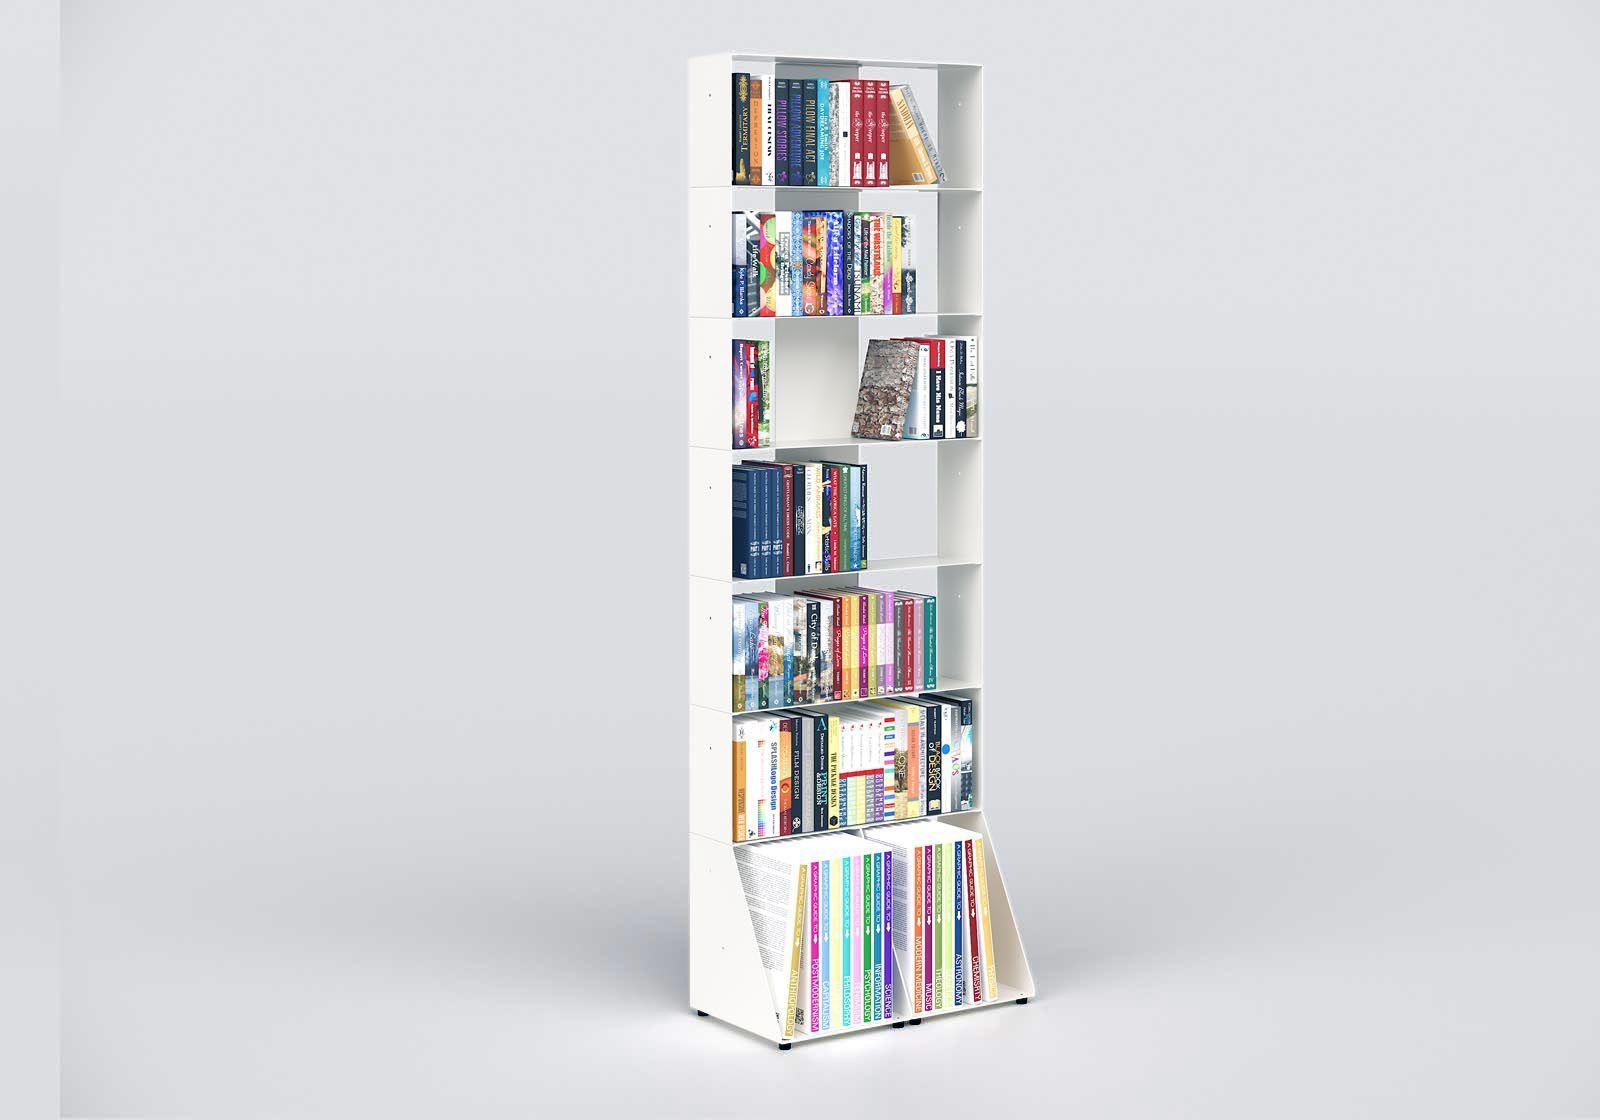 Librerias muebles 60 cm - metal blanco - 7 niveles